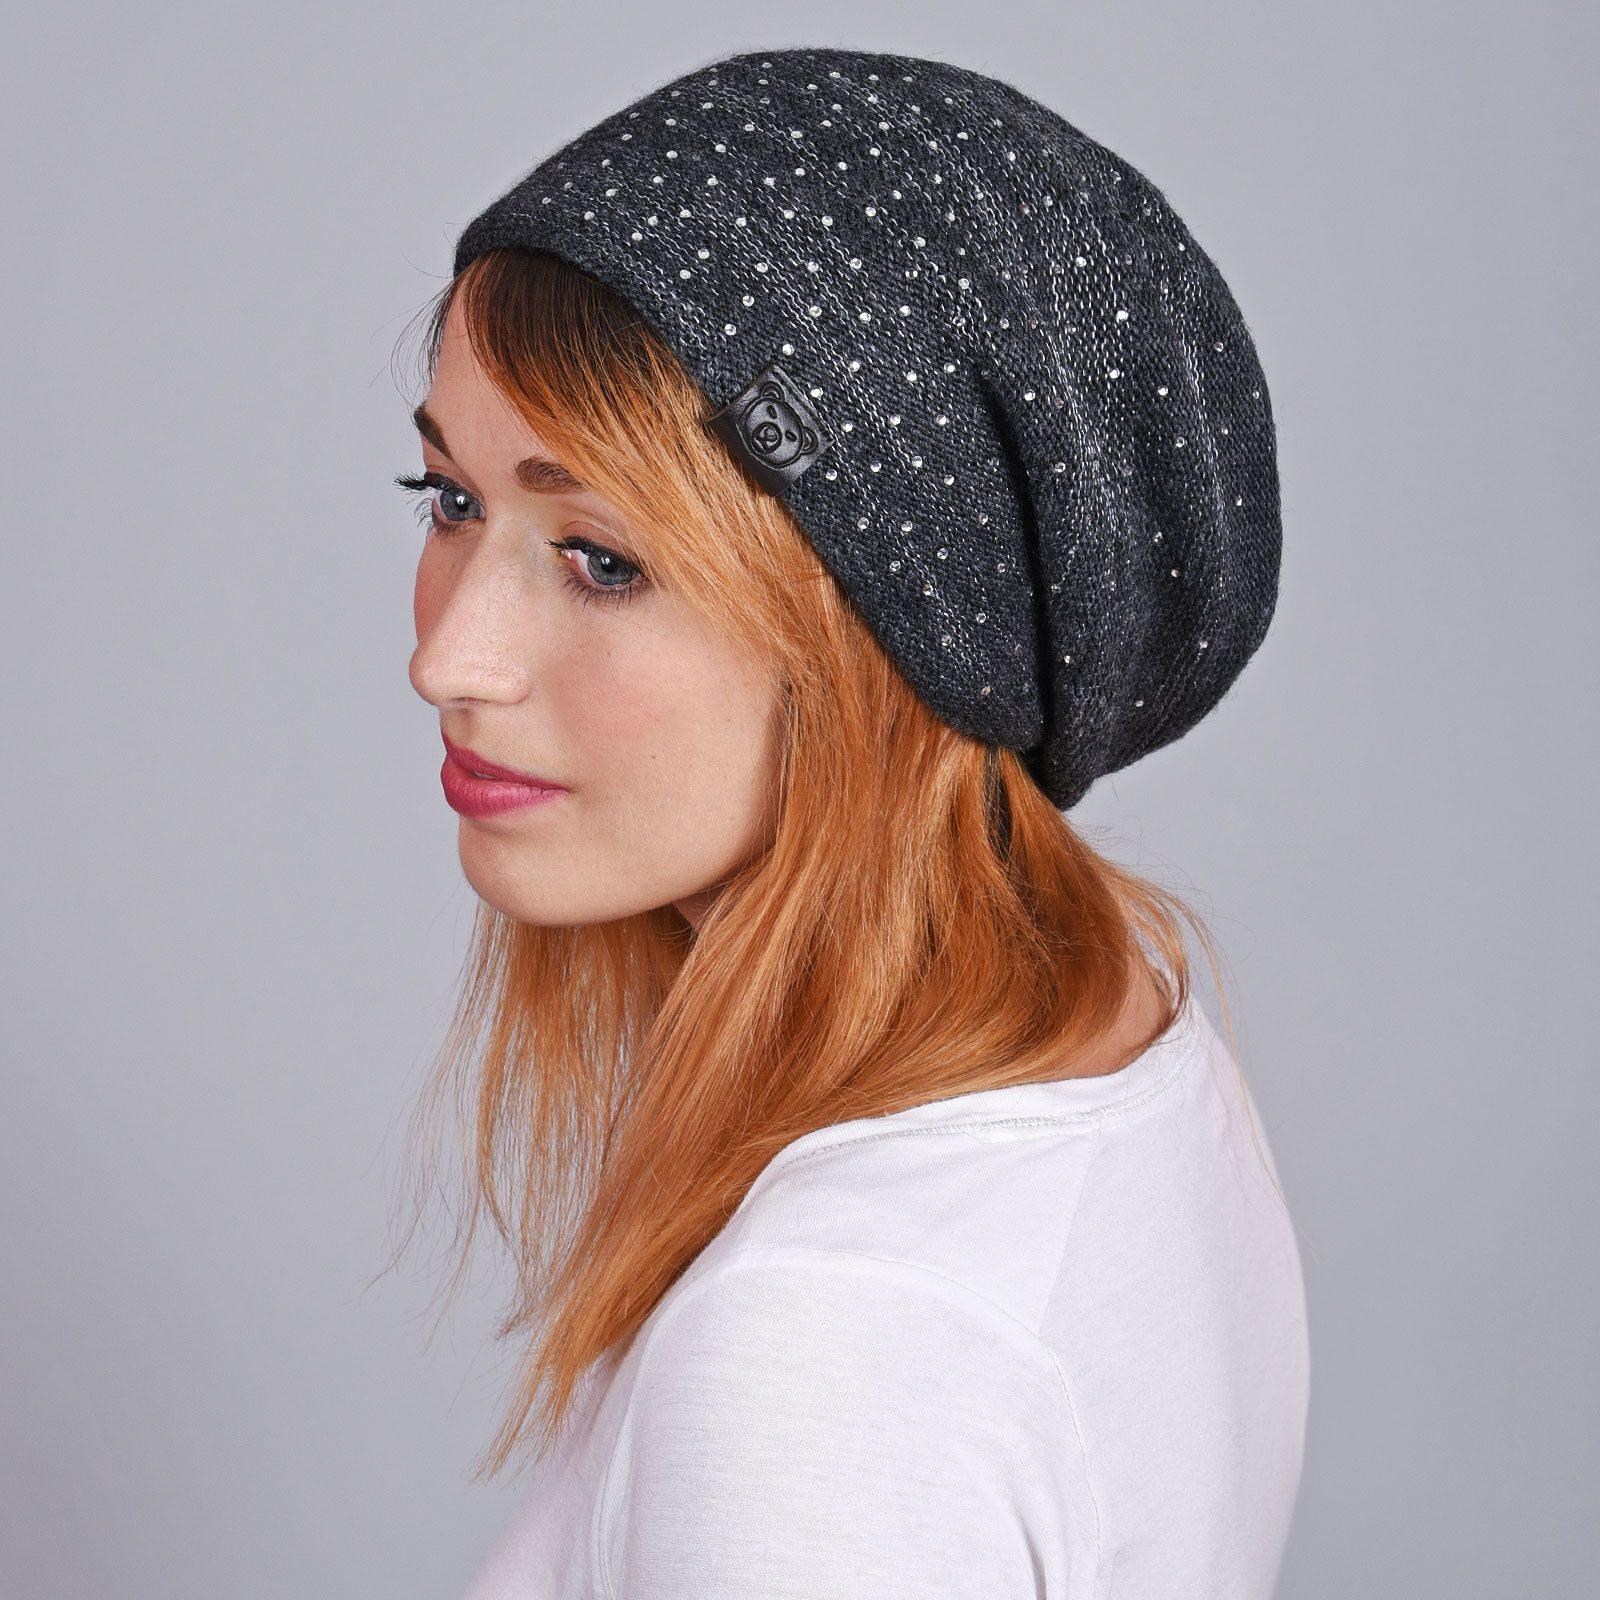 http://lookbook.allee-du-foulard.fr/wp-content/uploads/2018/12/CP-01062-VF16-1-bonnet-long-gris-fonce-brillants-1600x1600.jpg